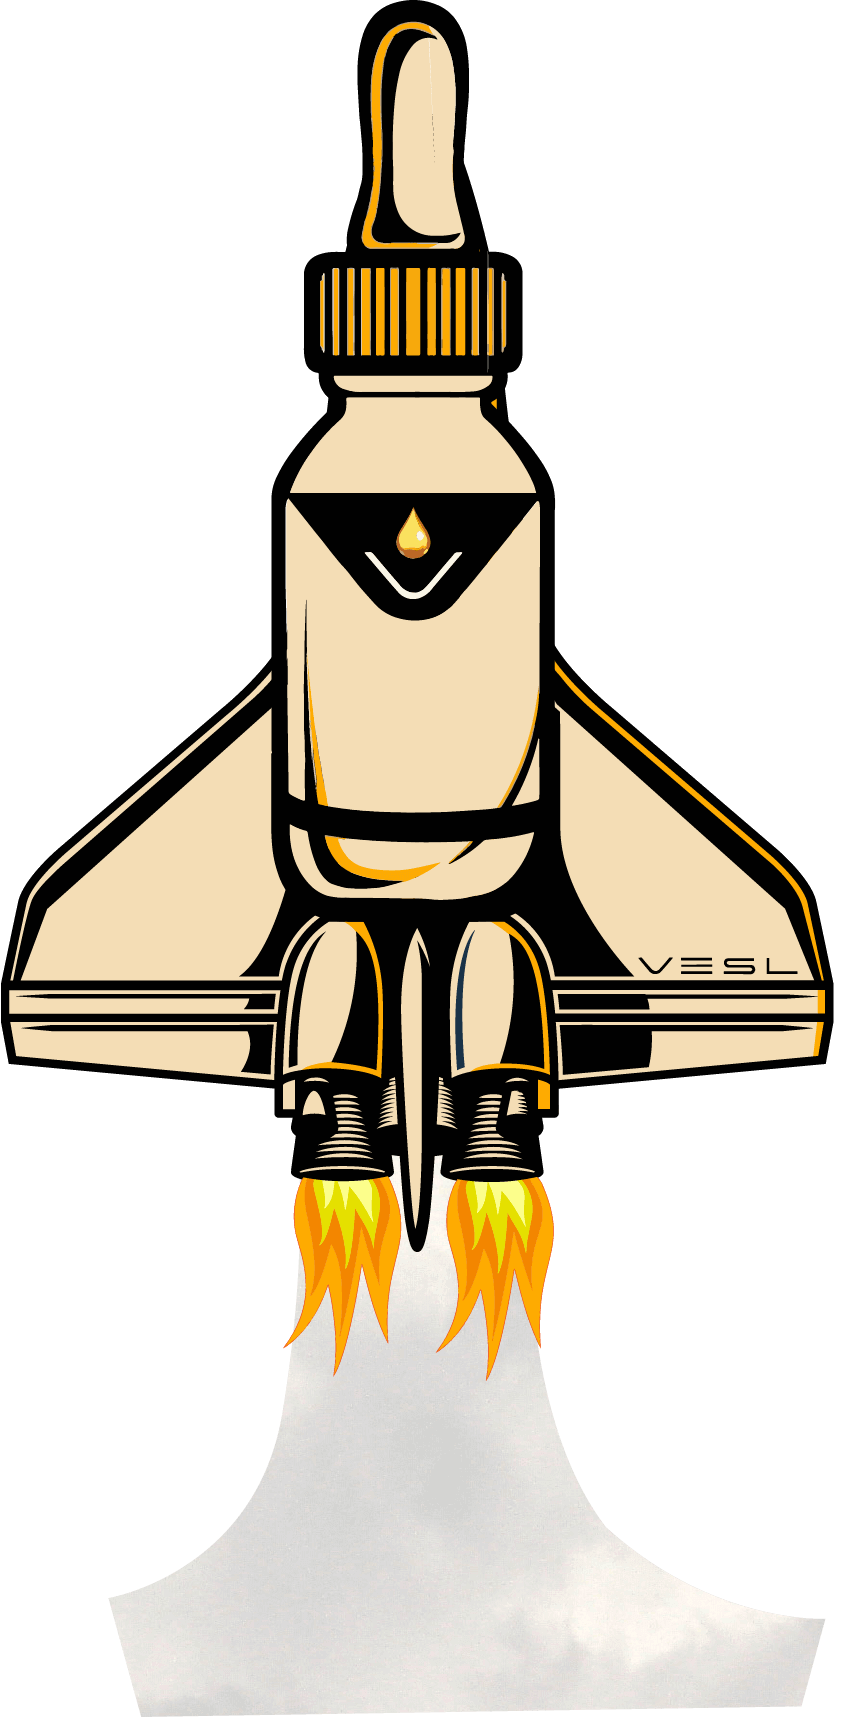 Vesl Oils Rocket Ship